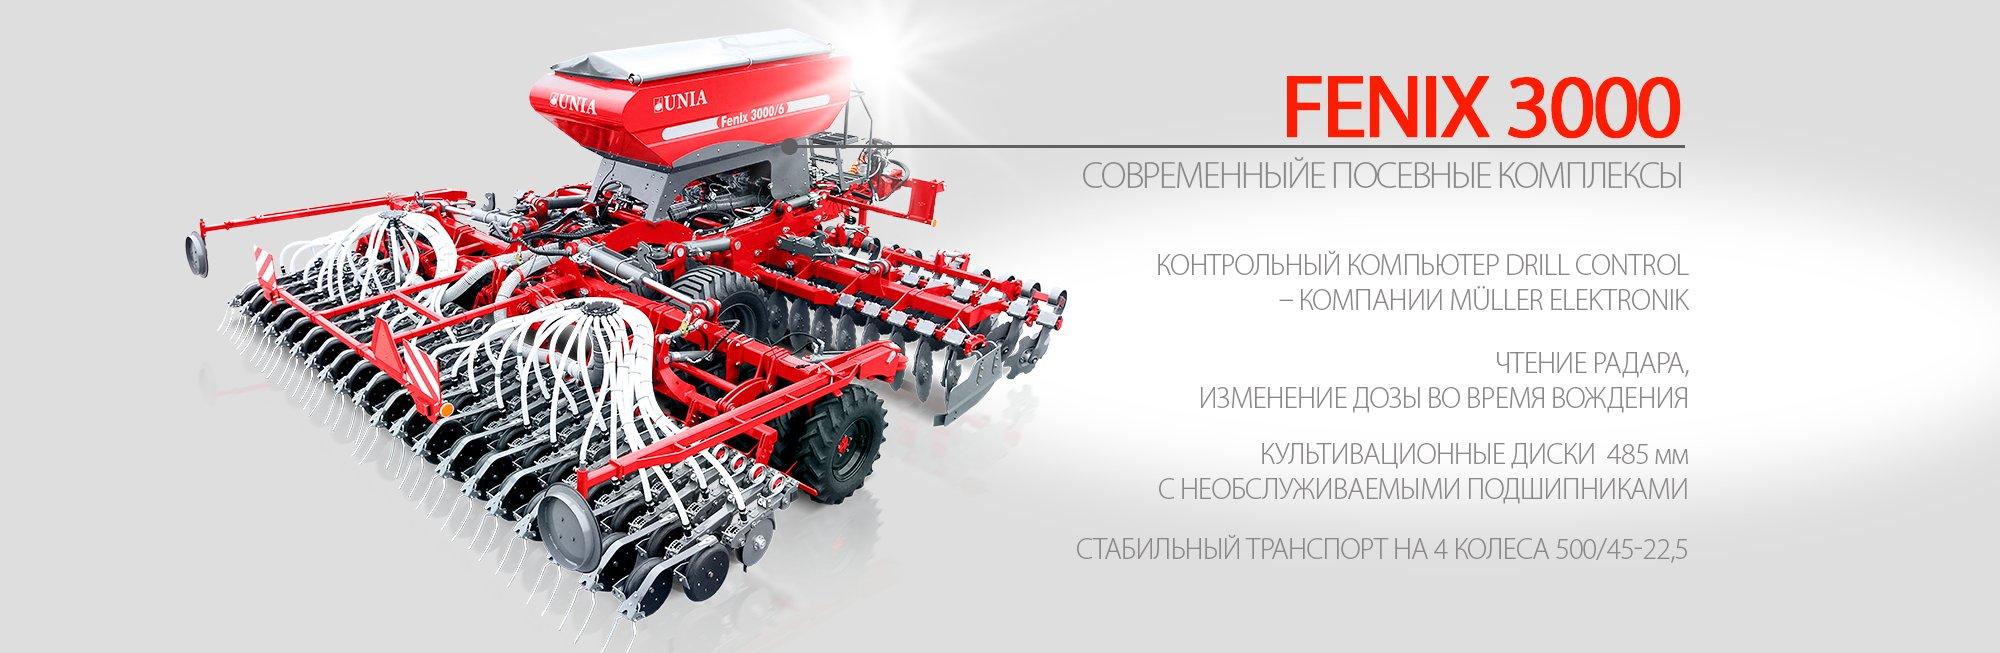 FENIX3000_RU_2